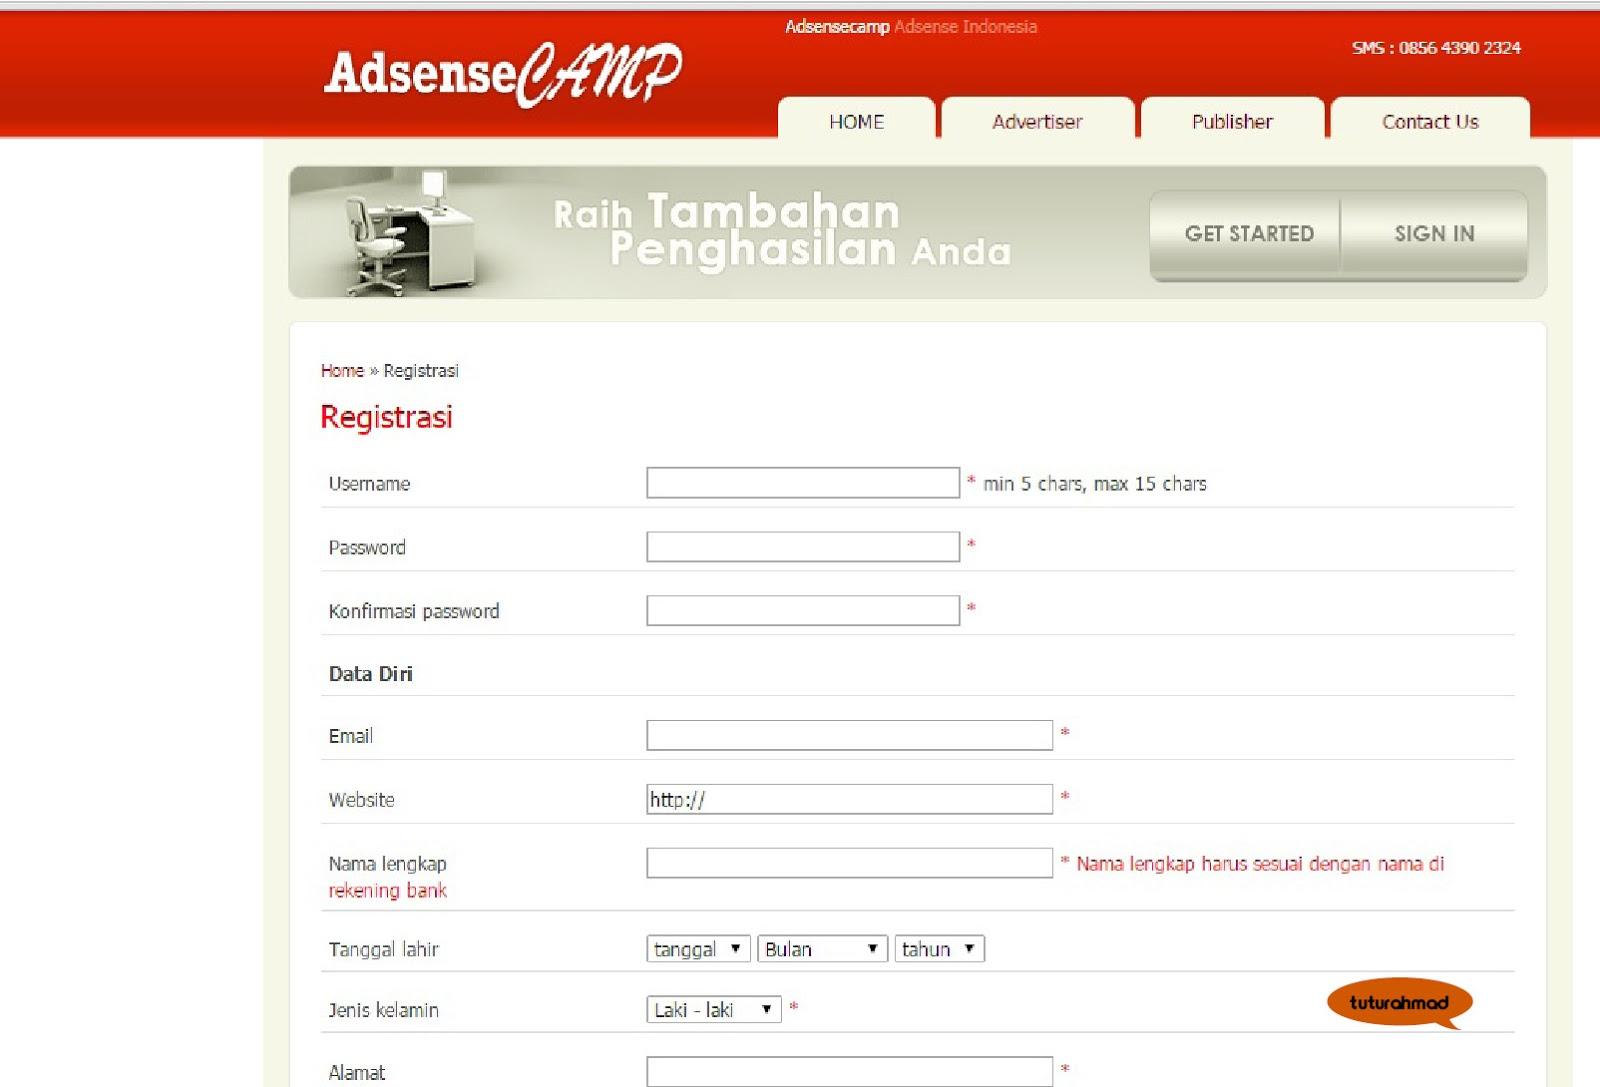 Cara Jadi Publisher Adsense